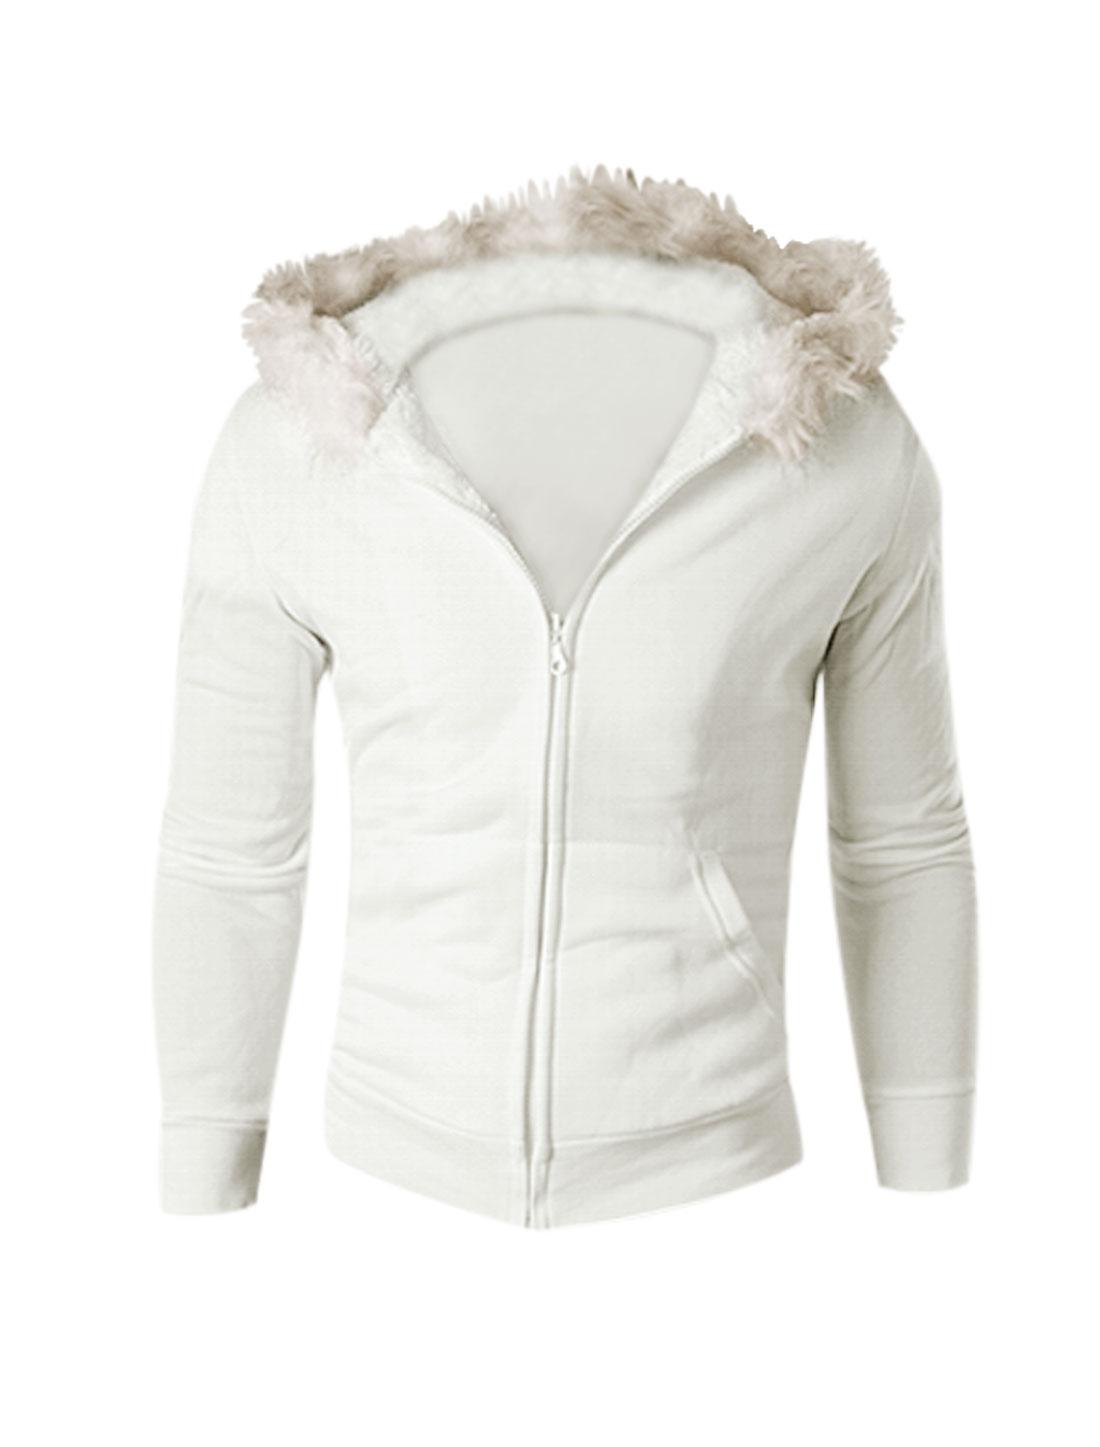 Man White Zip Up Contrast Lining Kangaroo Pockets Hoodie Sweatshirt S